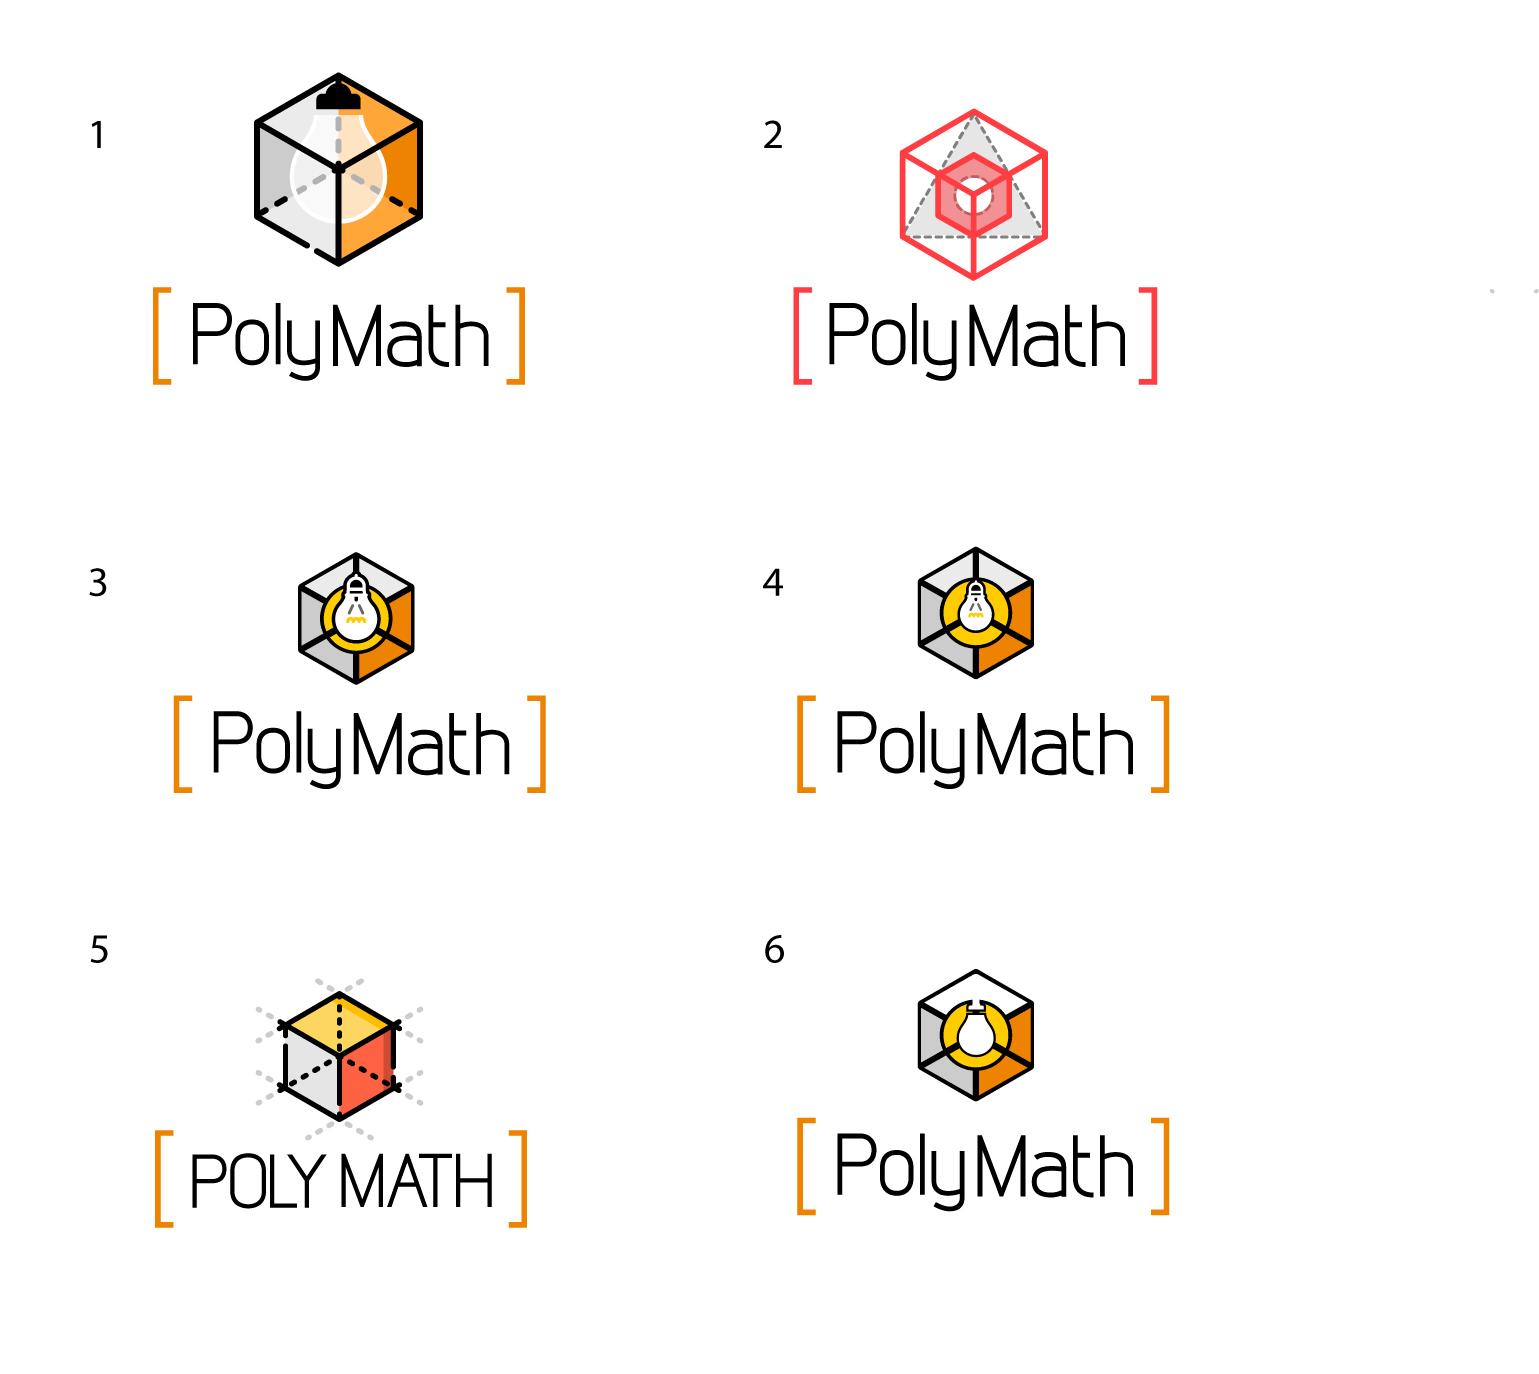 polymath-v5.jpg